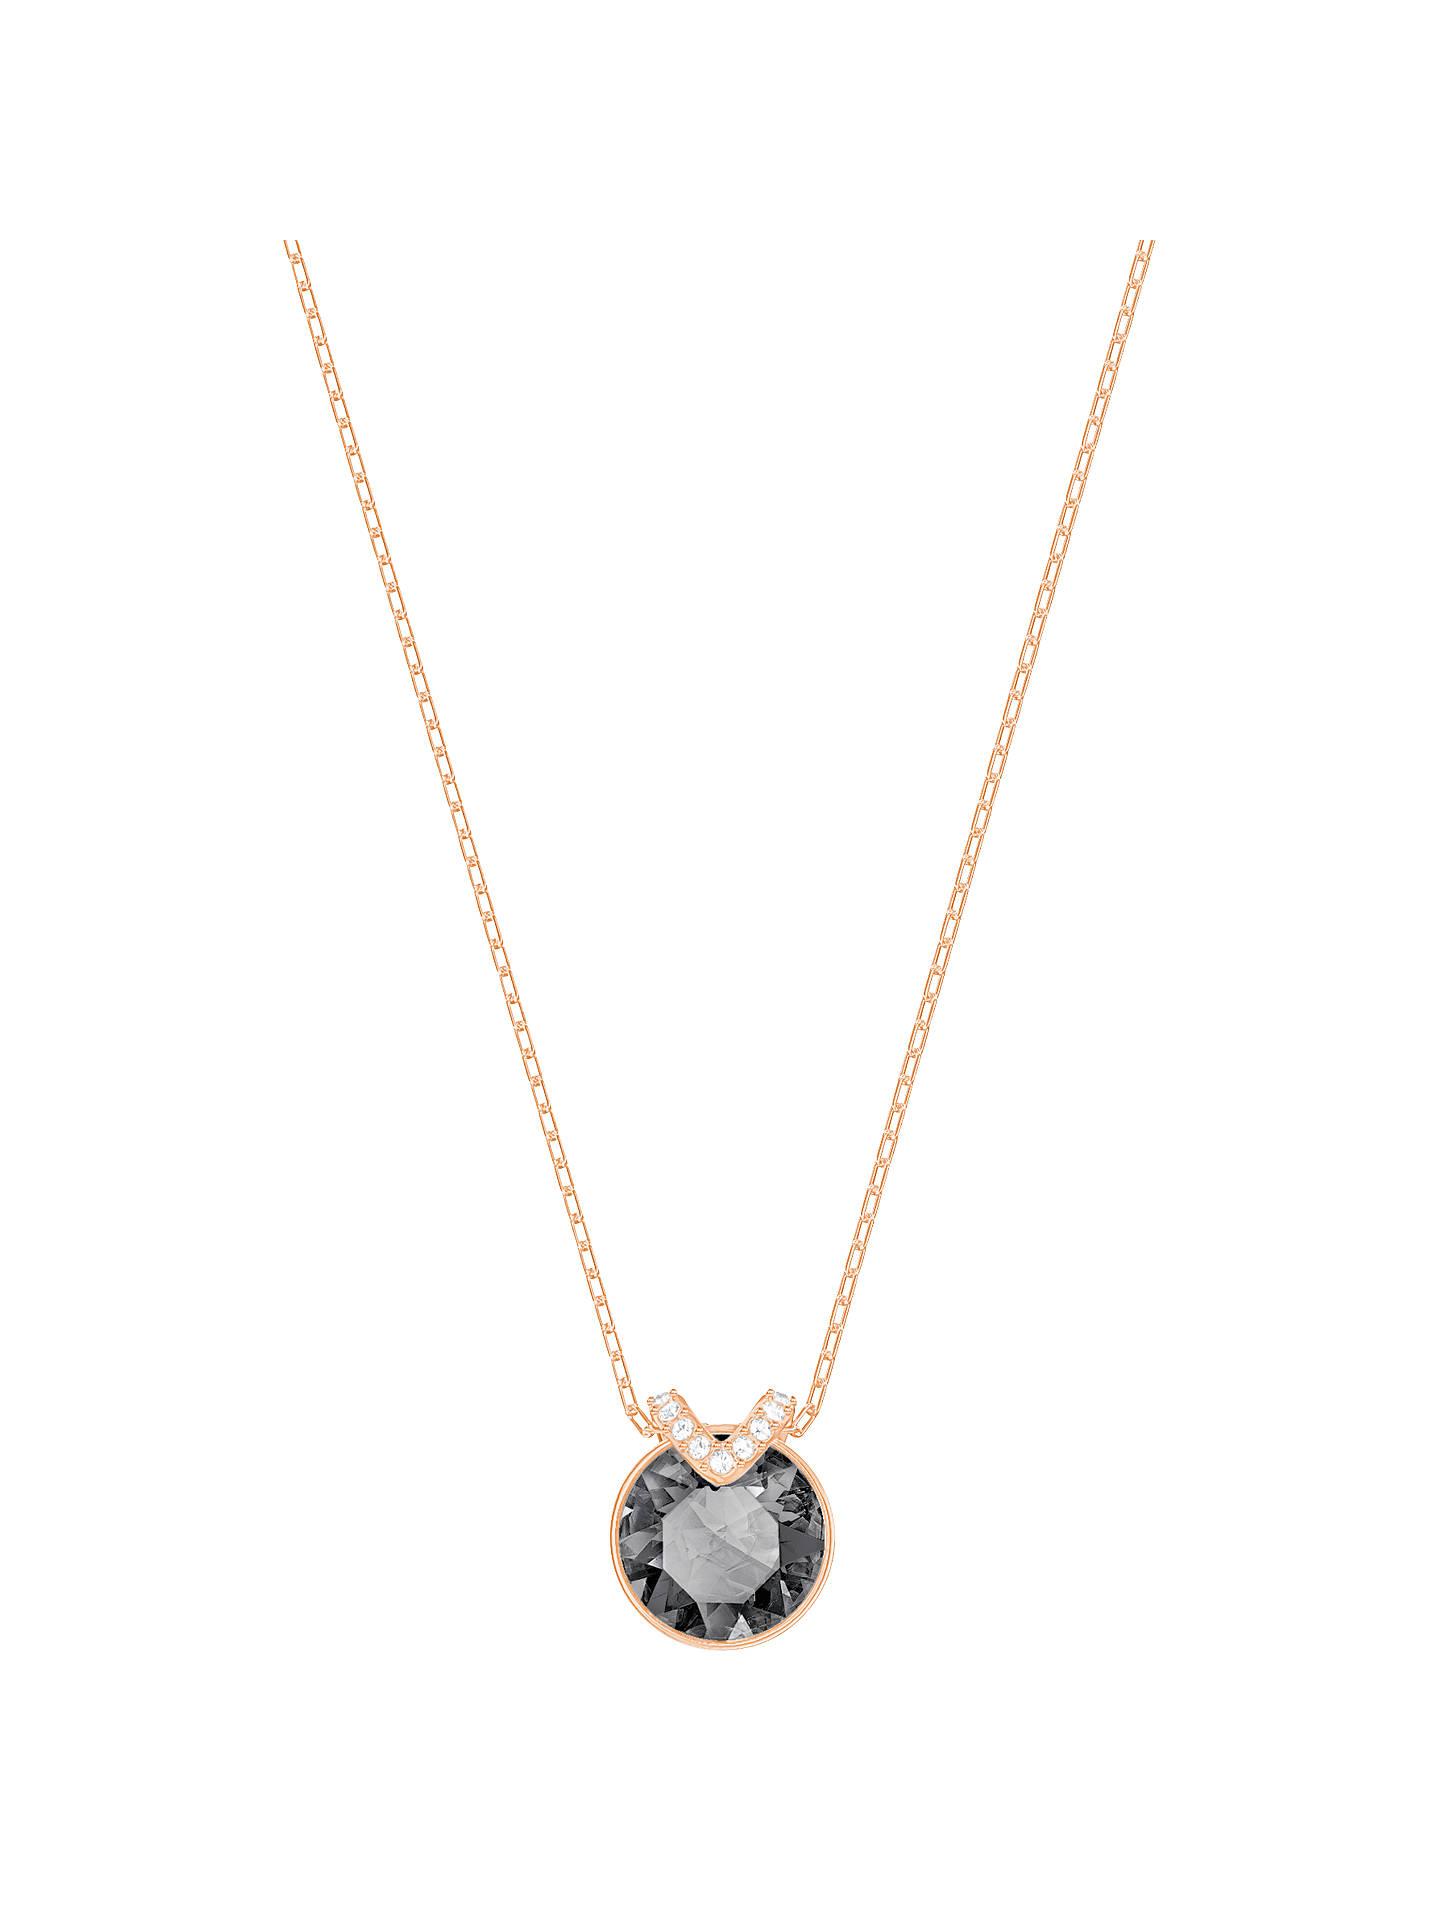 59dcfa84416a98 Buy Swarovski Bella V Crystal Pendant Necklace